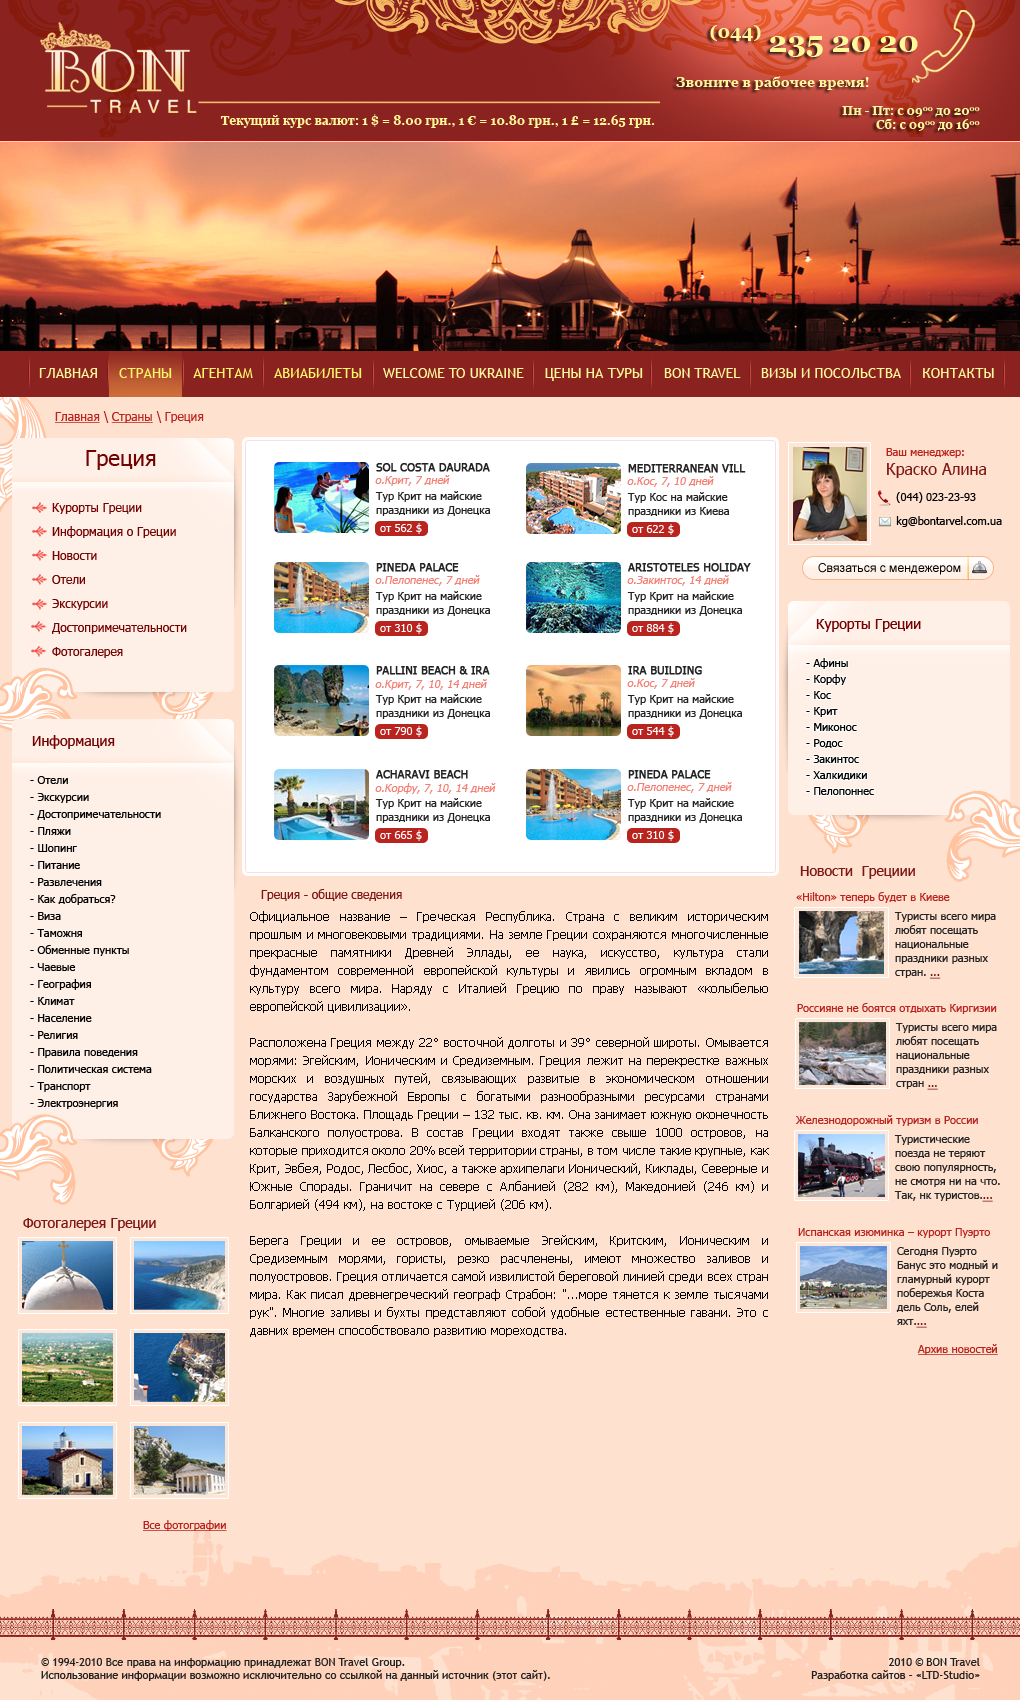 ТурФирма Bon Travel подробности страны